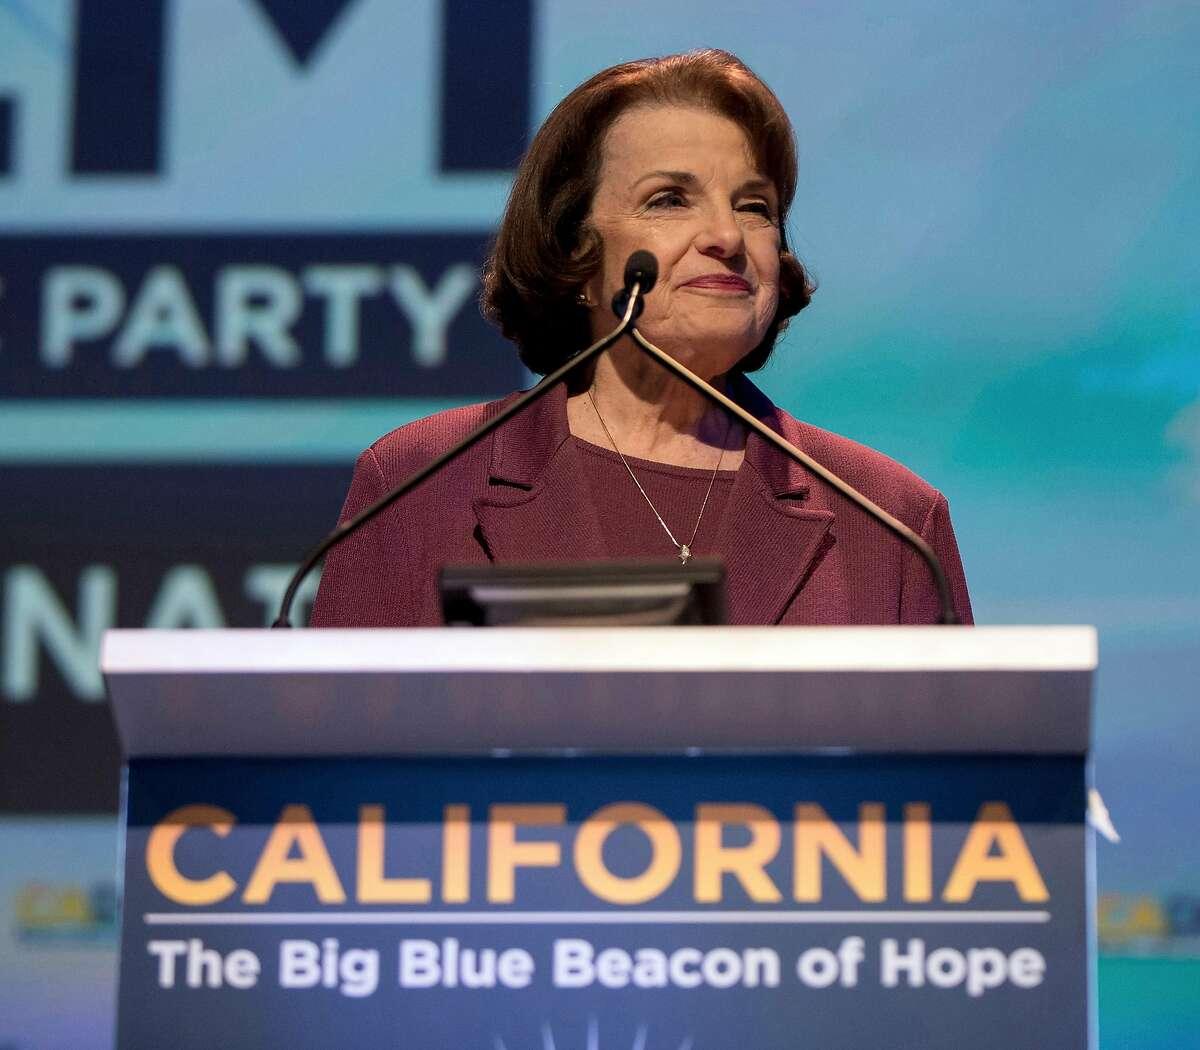 U.S. Senator Dianne Feinstein (D-CA) addresses the 2018 California Democrats State Convention on Feb. 24, 2018 in San Diego, Calif. (Brian Cahn/Zuma Press/TNS)